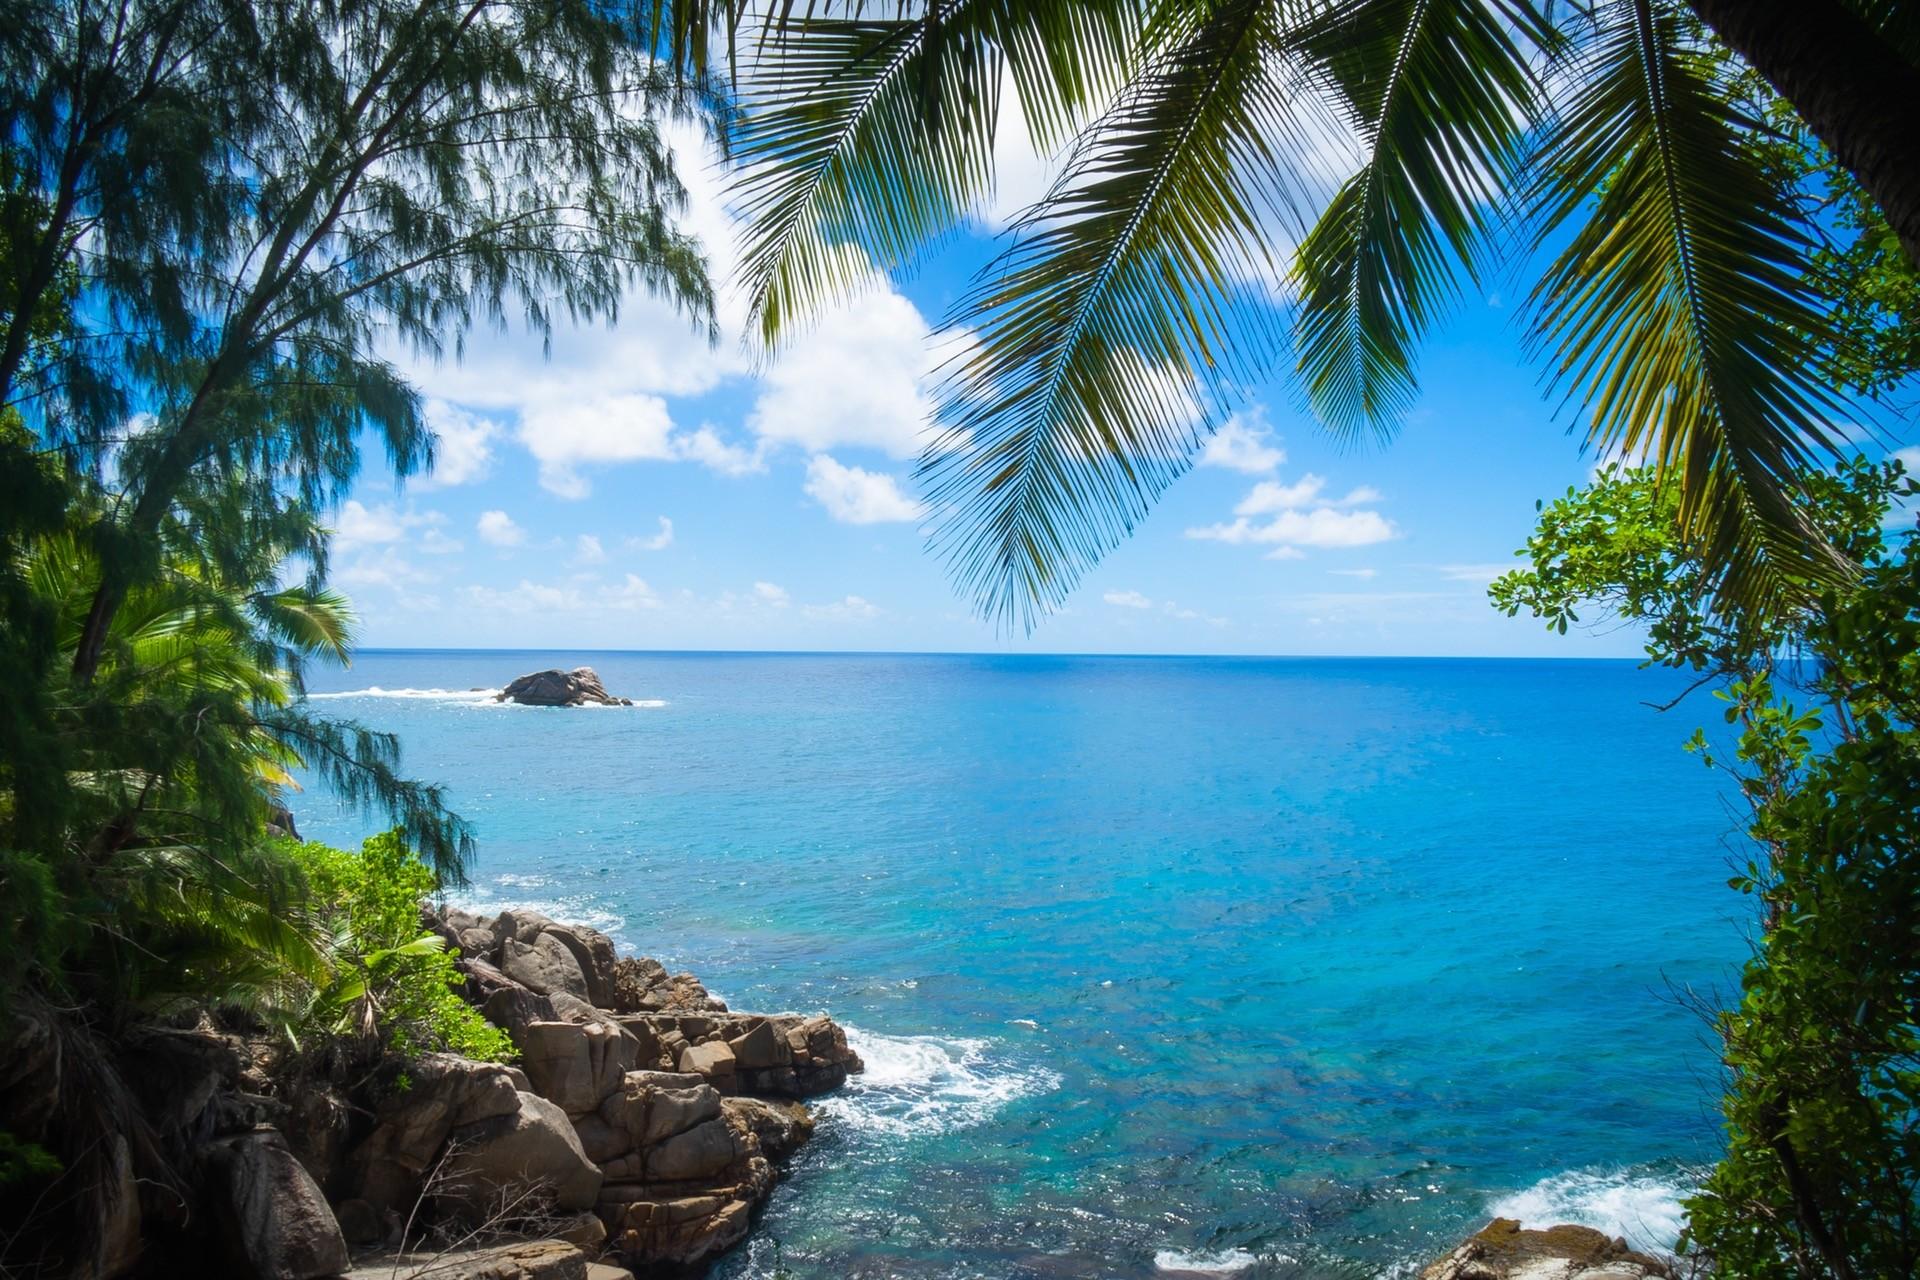 Wallpaper : Sea, Bay, Clouds, Beach, Coast, Palm Trees